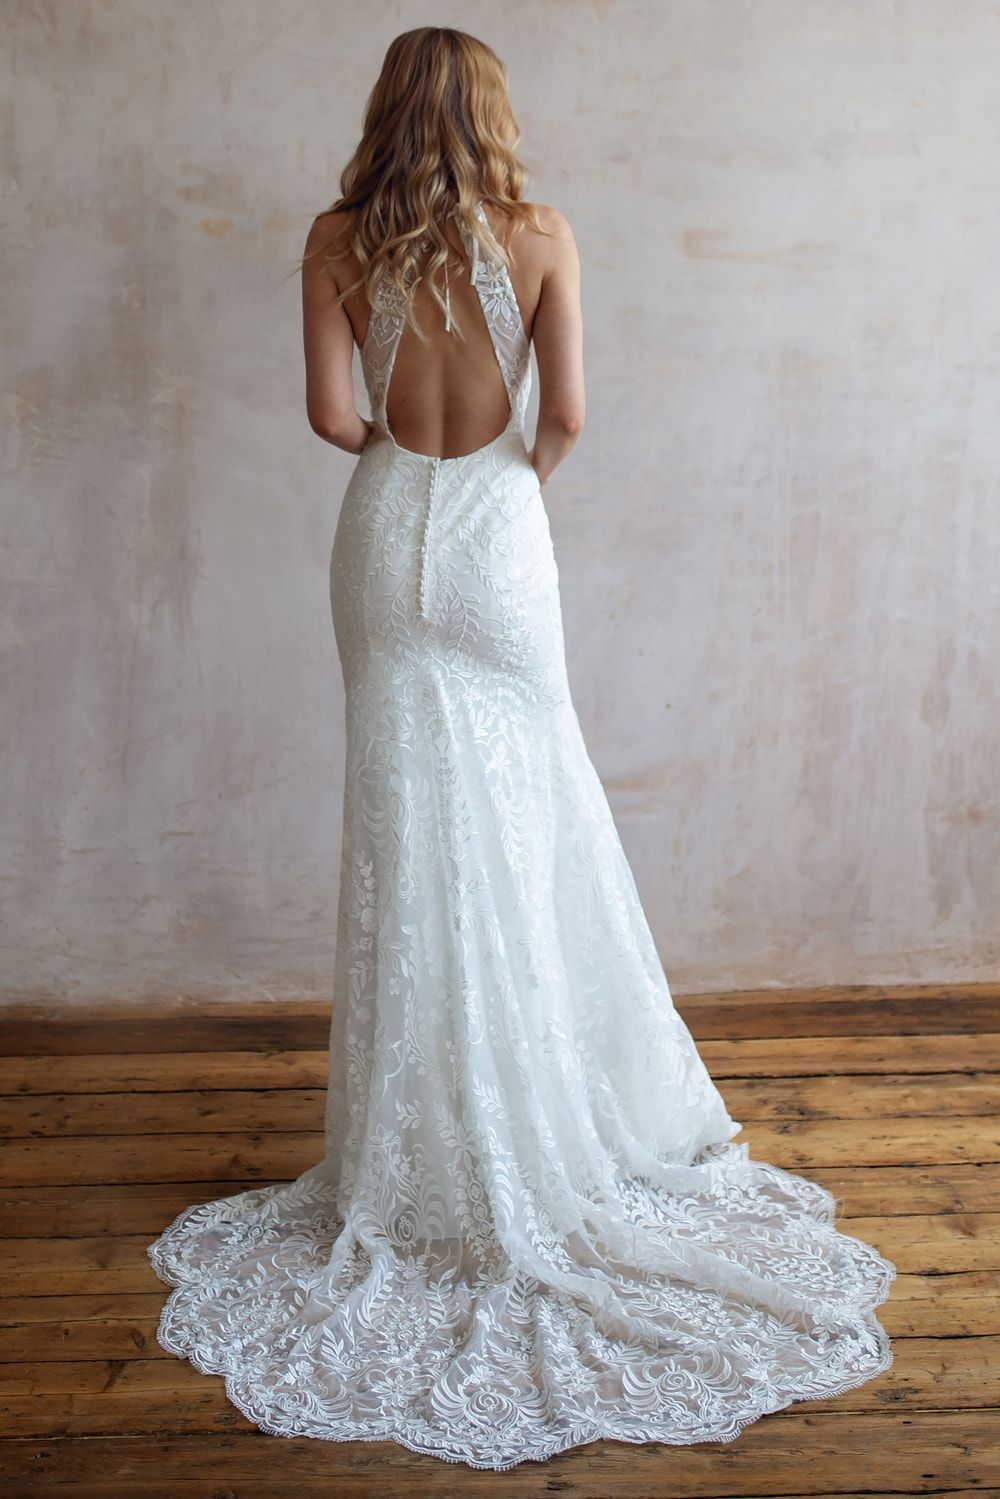 Boho Wedding Dress Bridal Shops Near Me Wedding Dresses Lace Lace Wedding Dresses Wedding Dress Lace Lace Wedding Dress Wedding Dresses 14 3